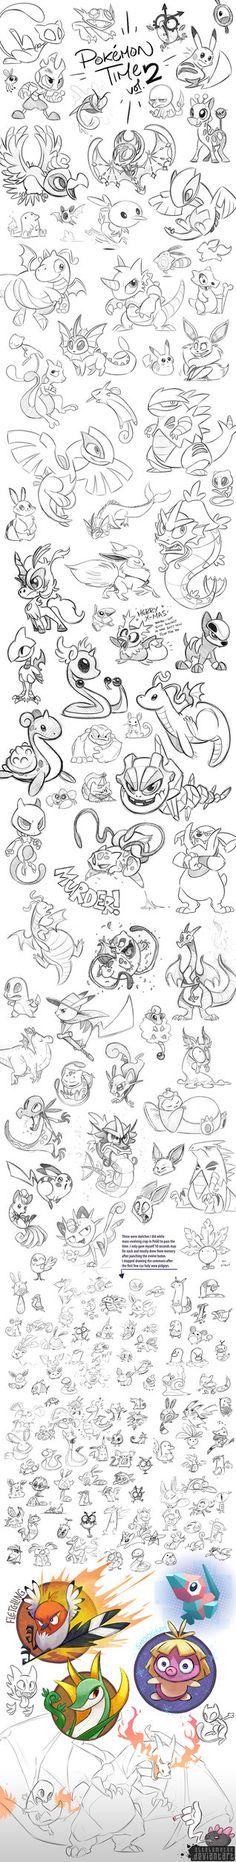 Pokemon Time 2 by Altalamatox